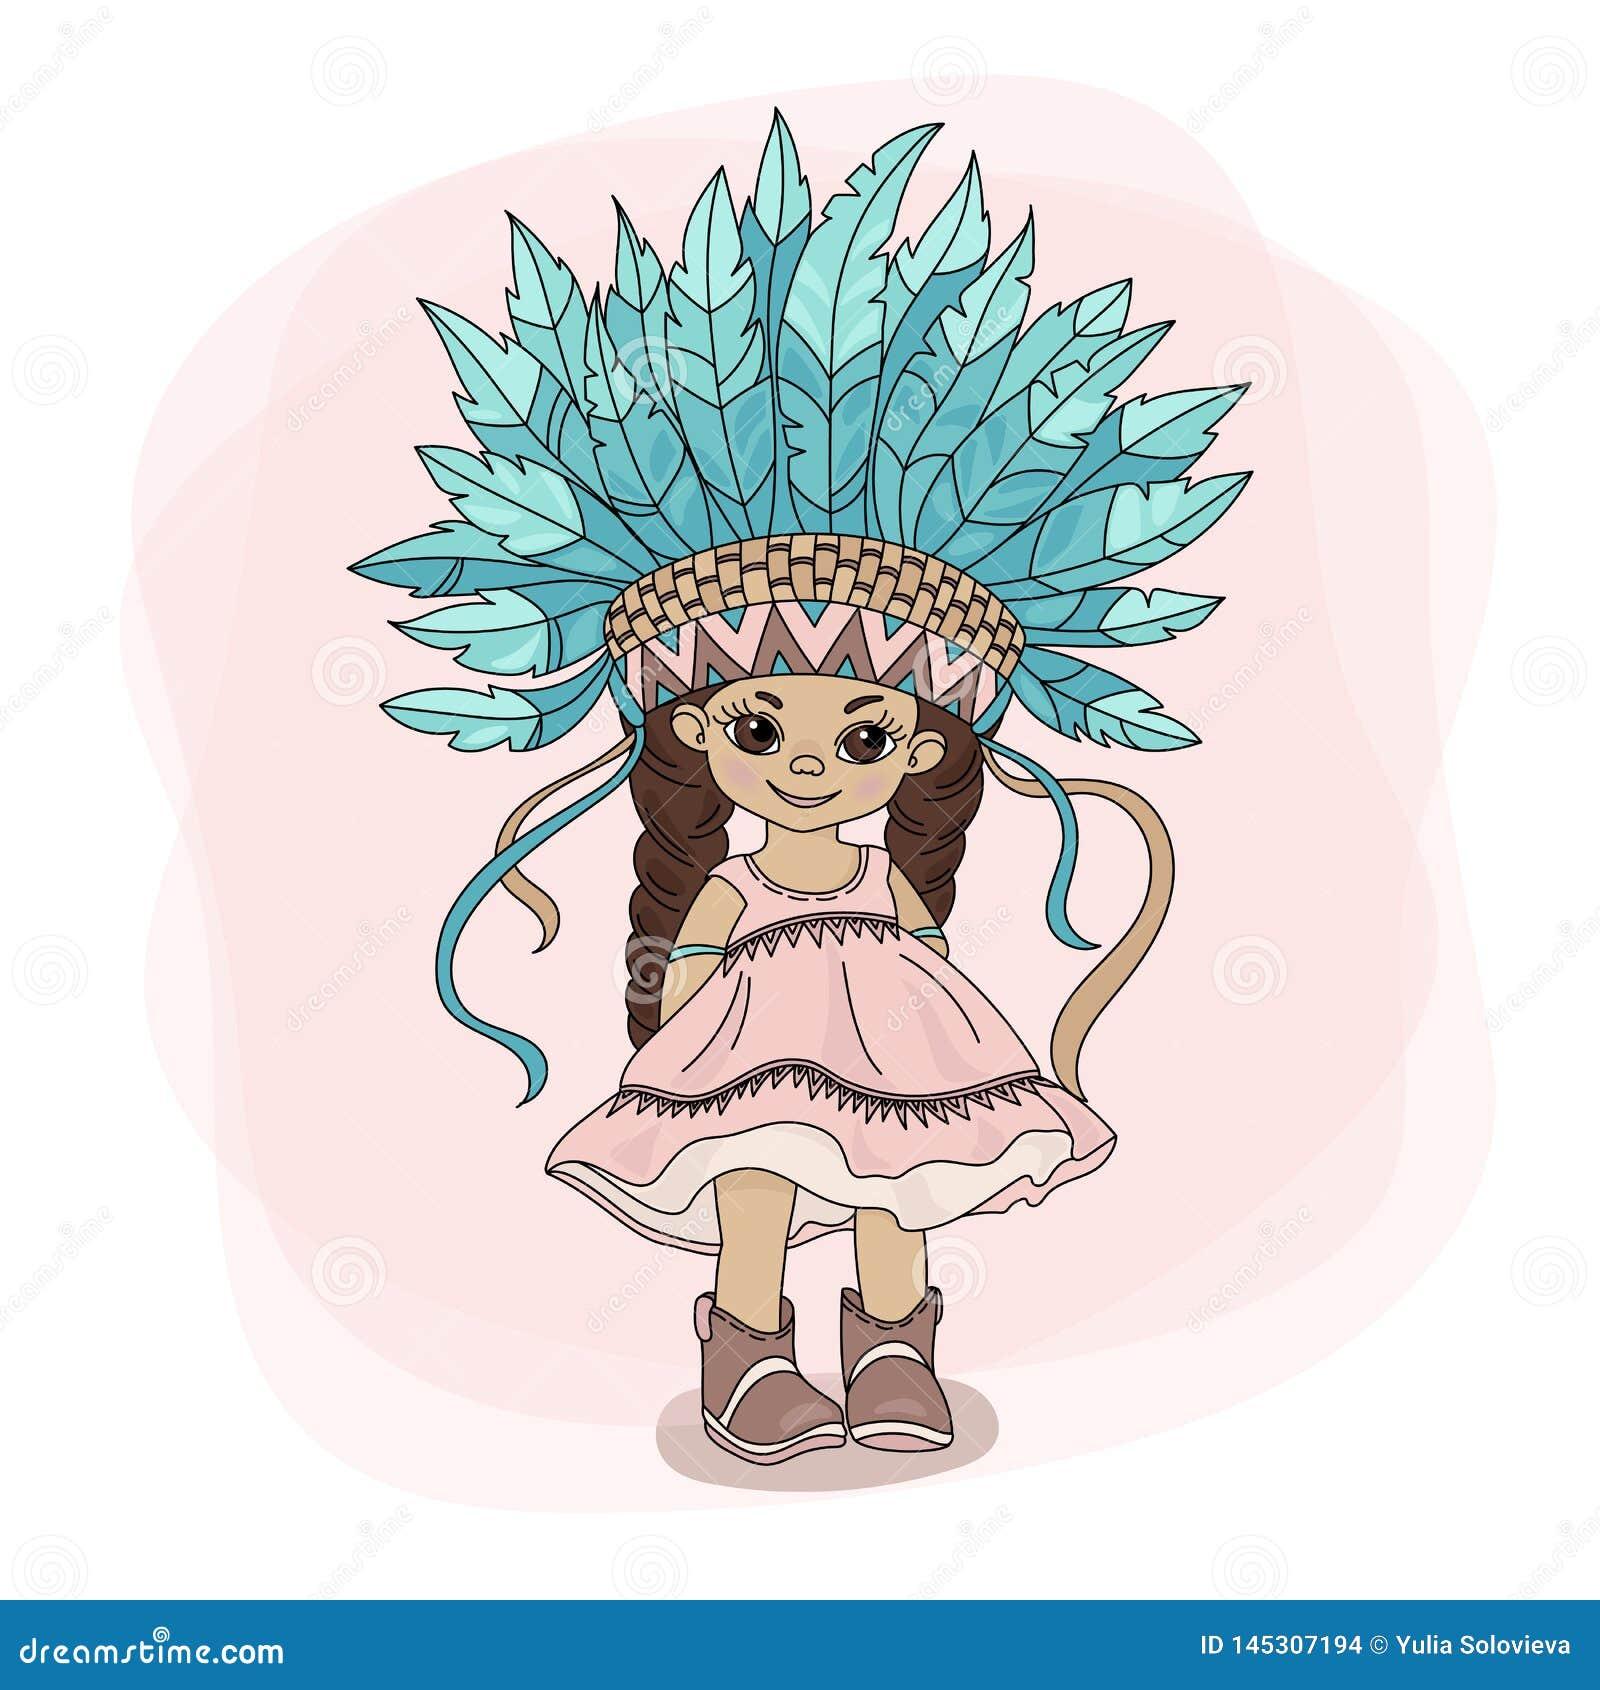 YOUNG POCAHONTAS Indian Princess Hero Vector Illustration Set